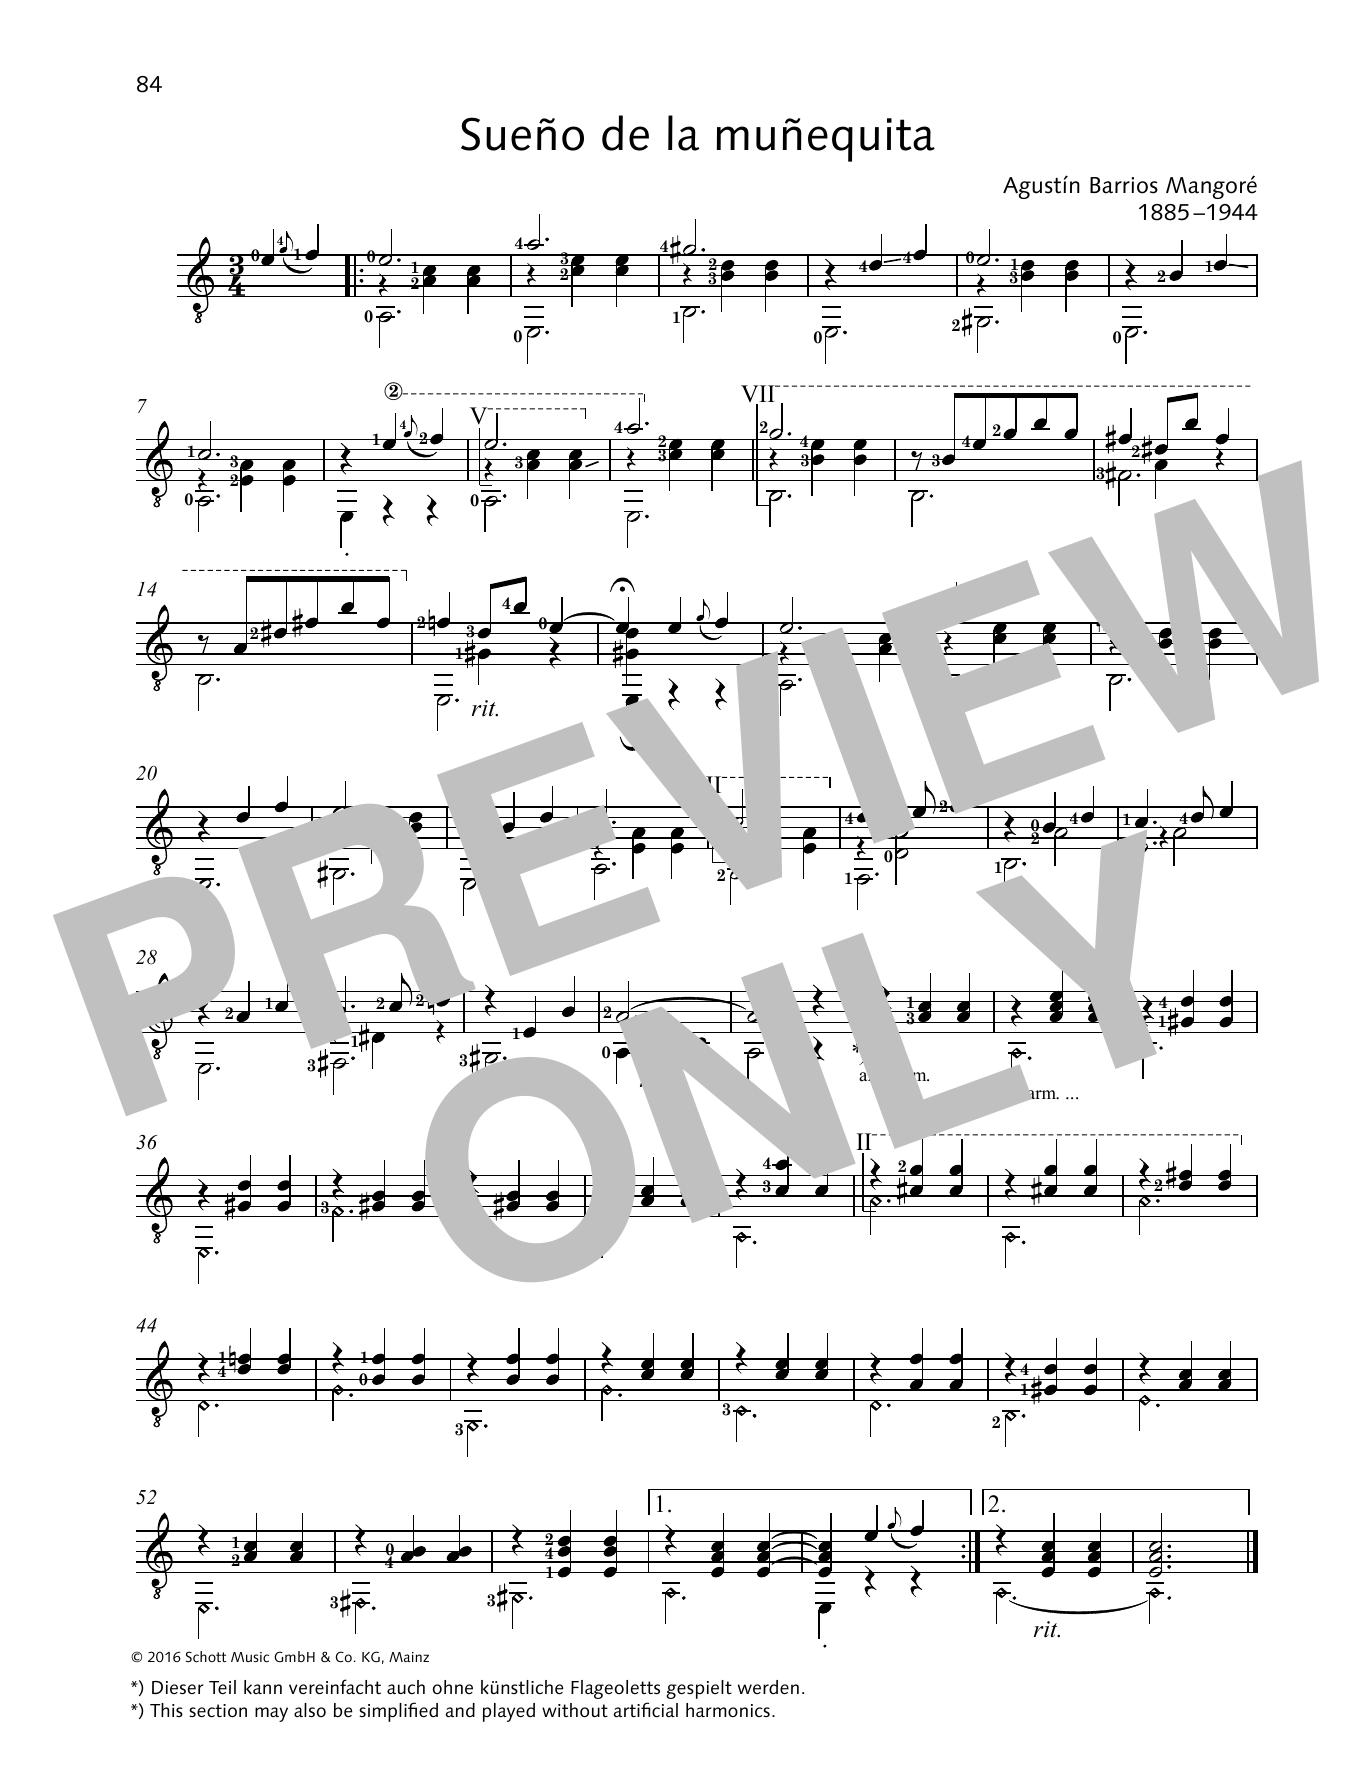 Sueño de la muñequita Sheet Music